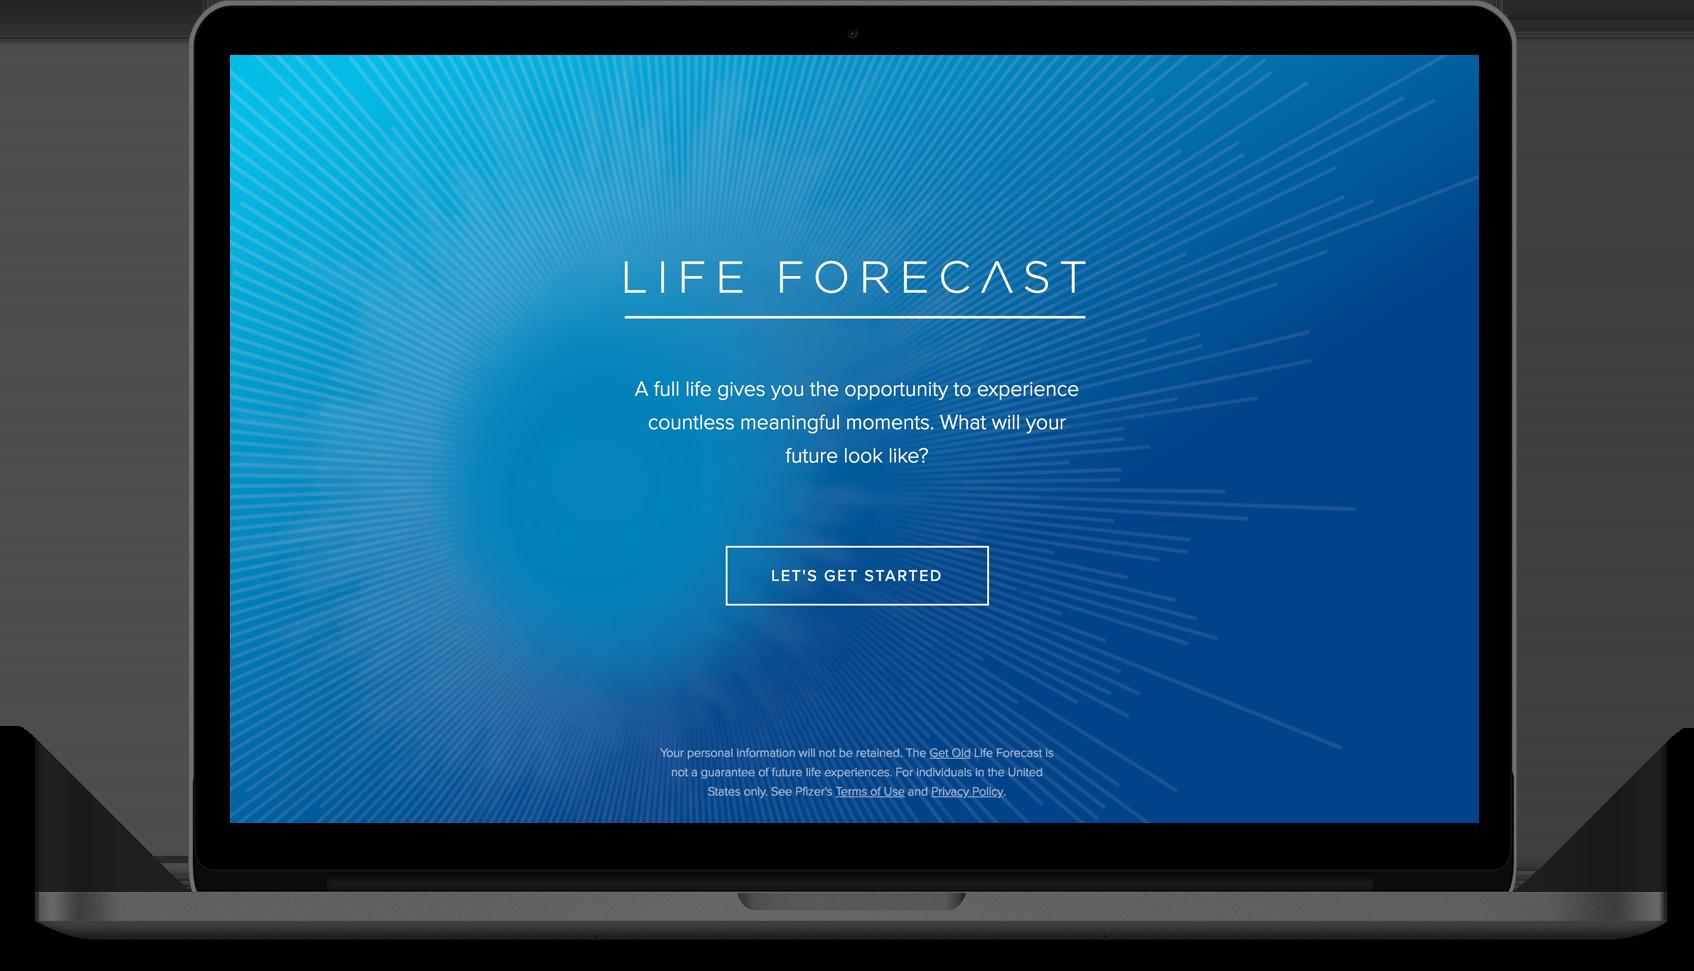 Life-Forecast-Intro